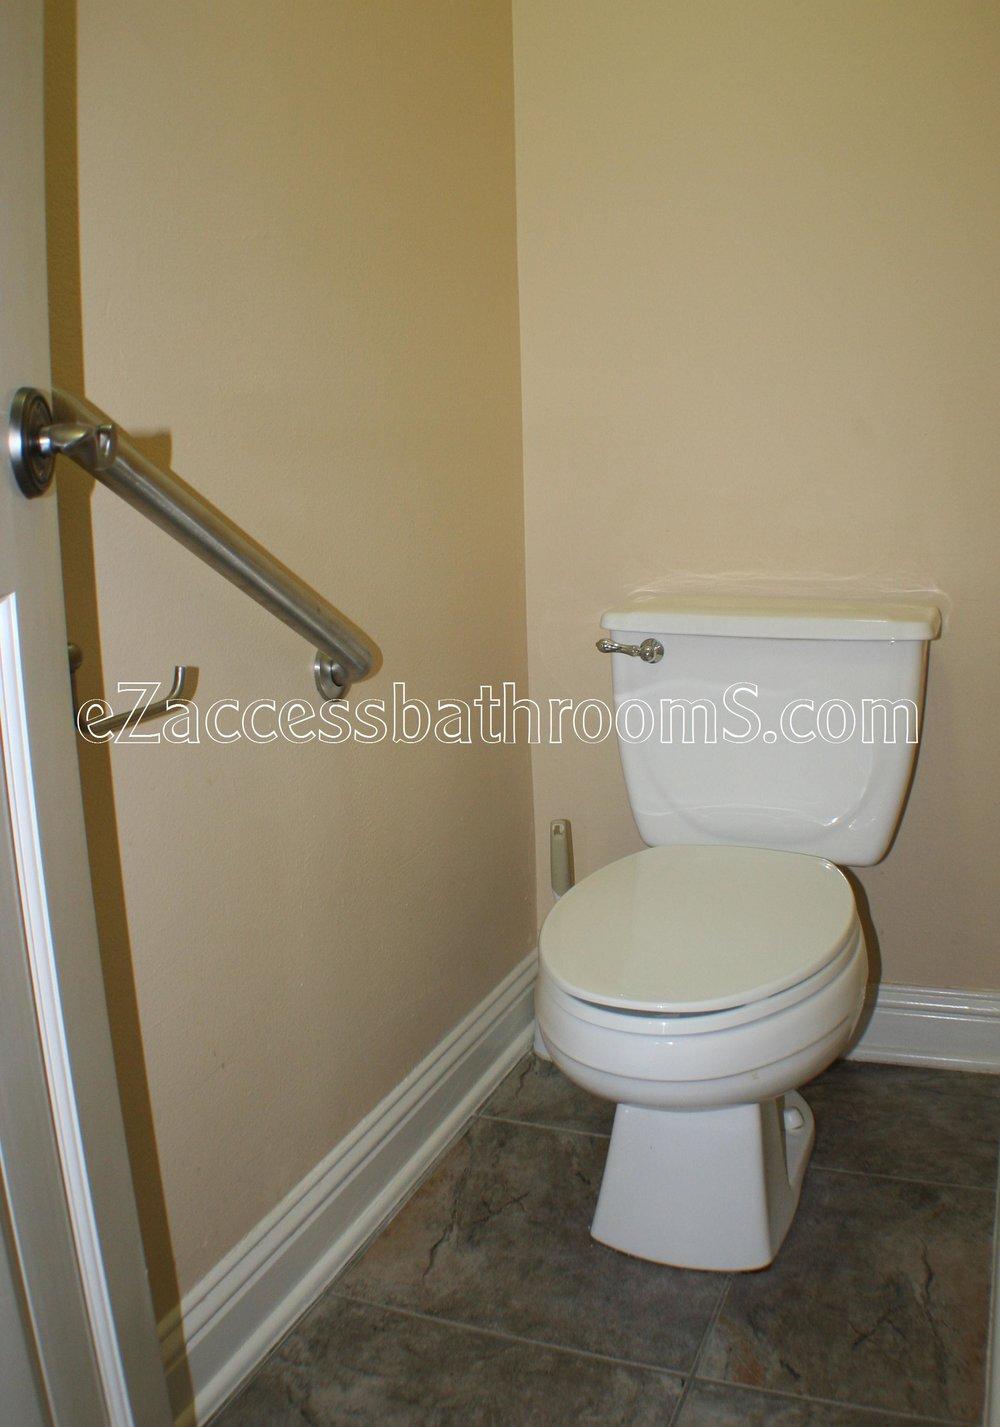 toilet grab bars installation houston 008.JPG